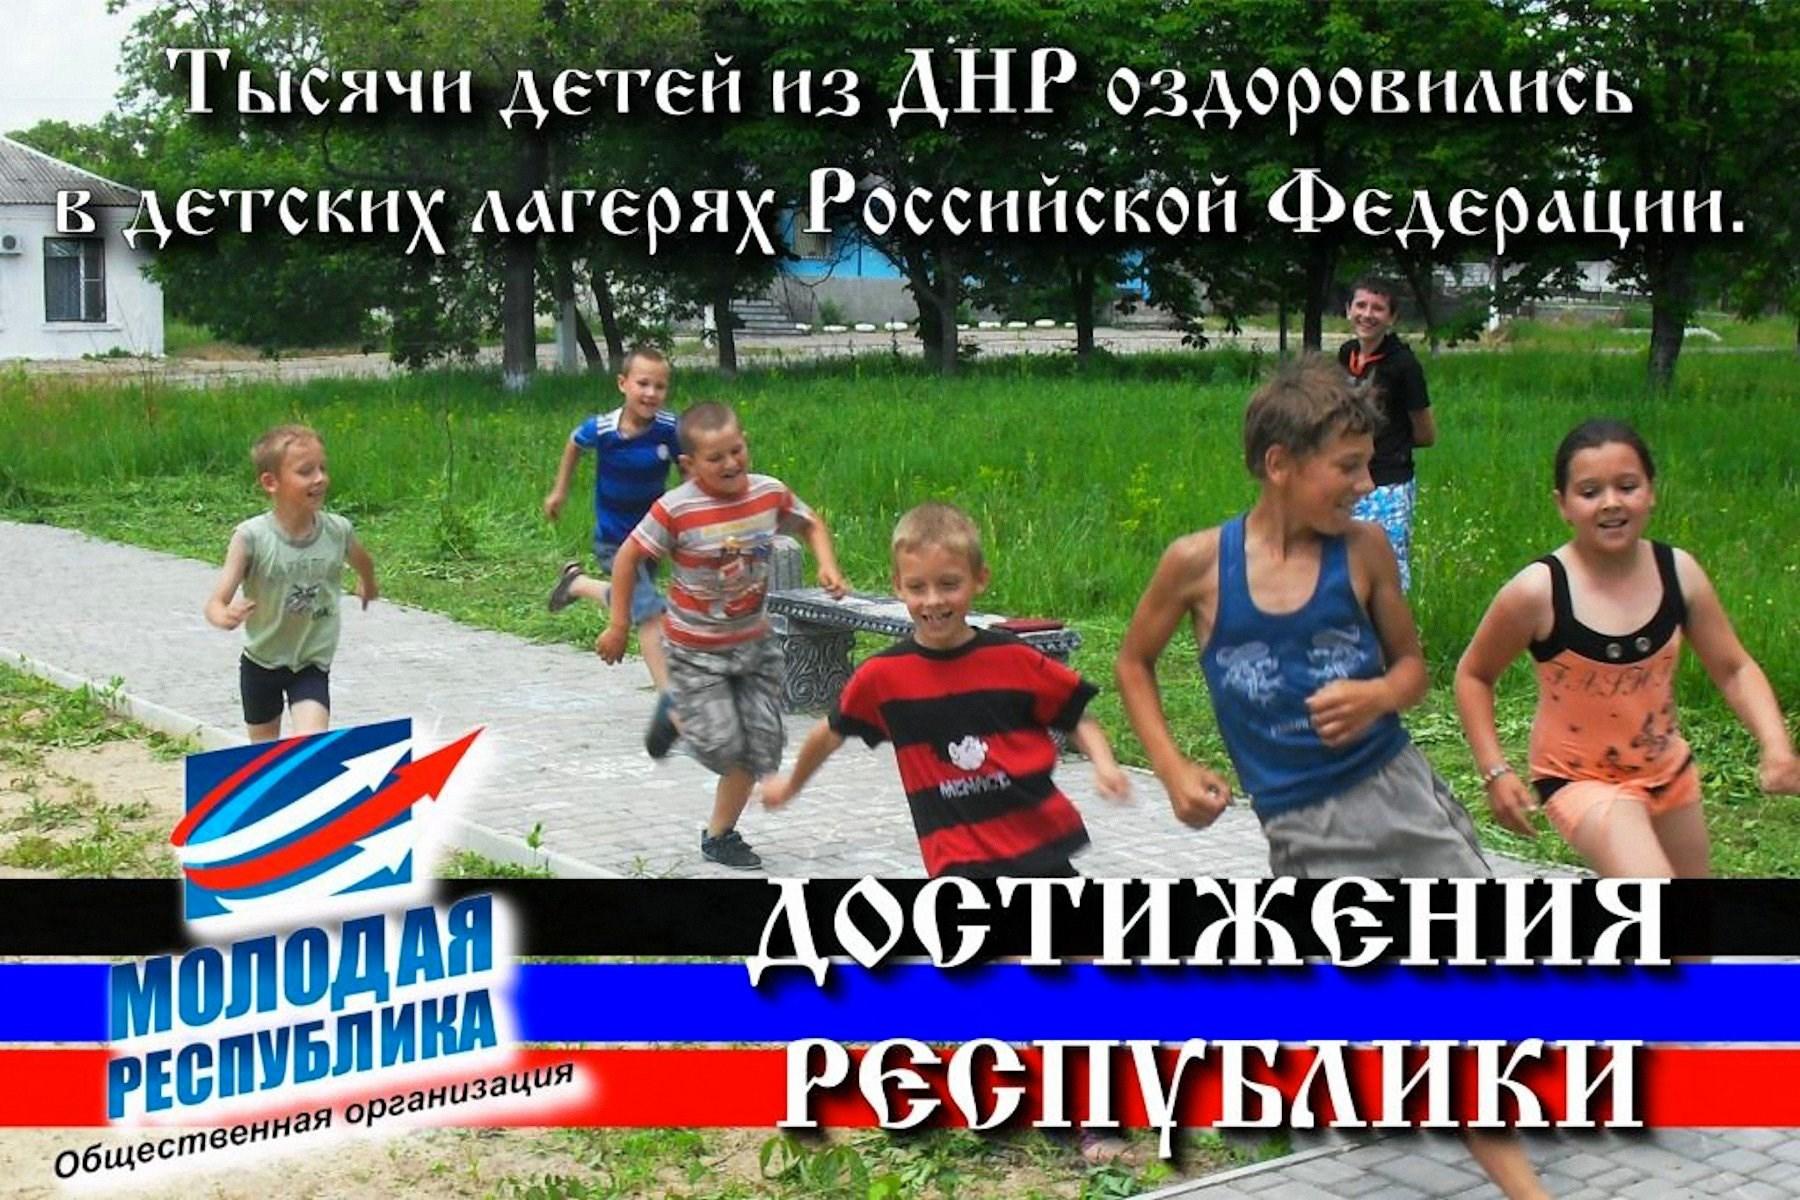 00 property of the republic dnr donetsk pr 02 280815